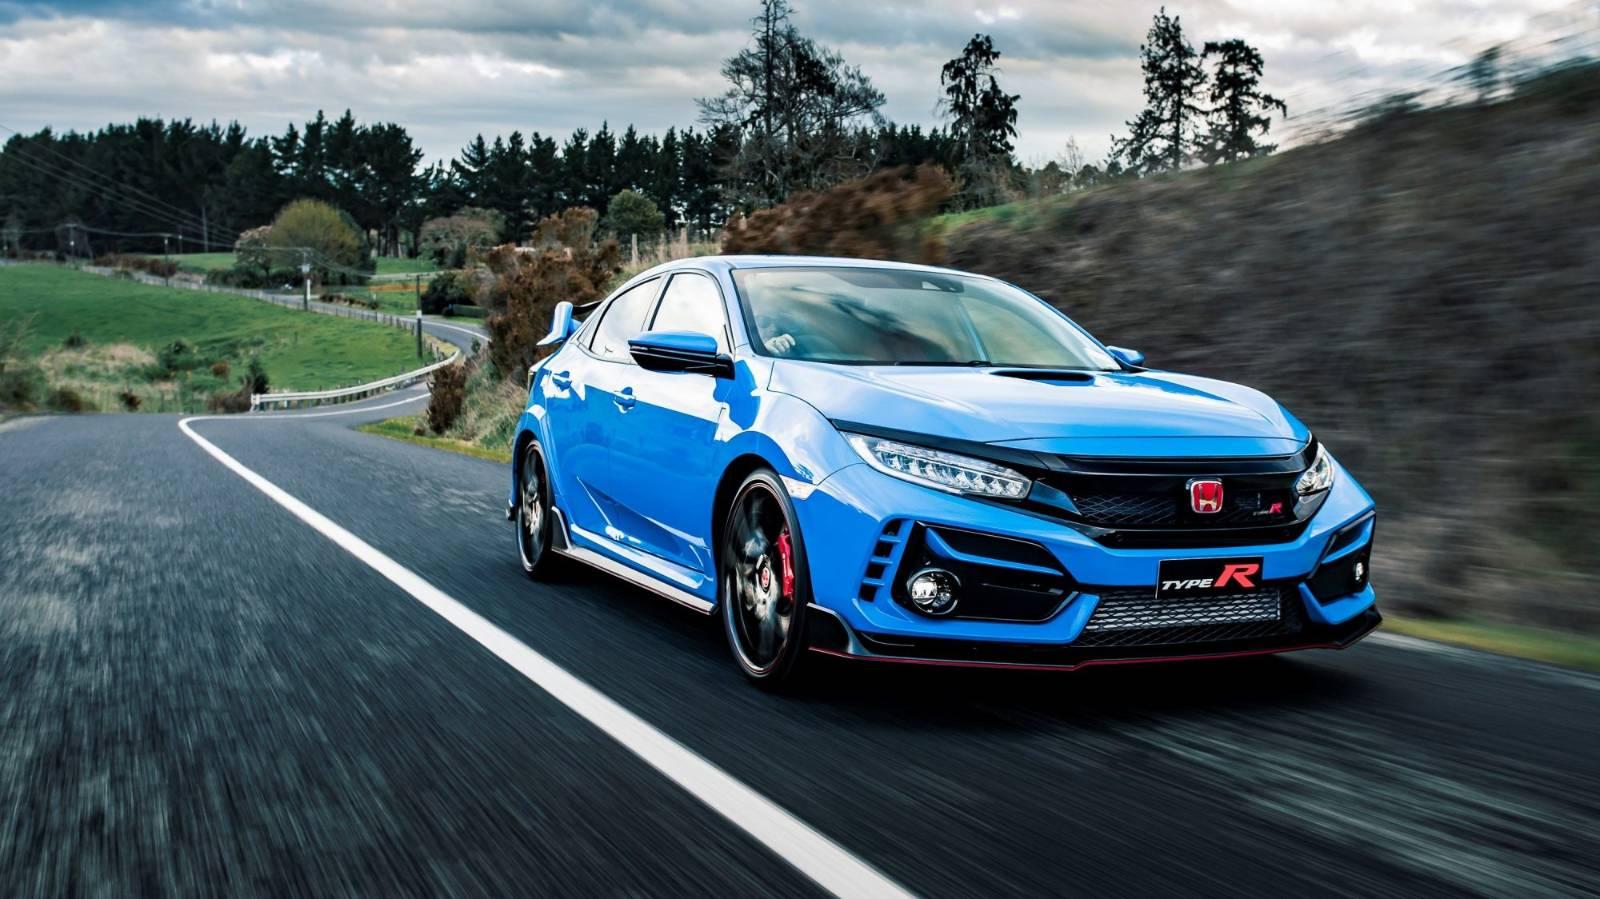 Refined aggression: Honda hones the Type R